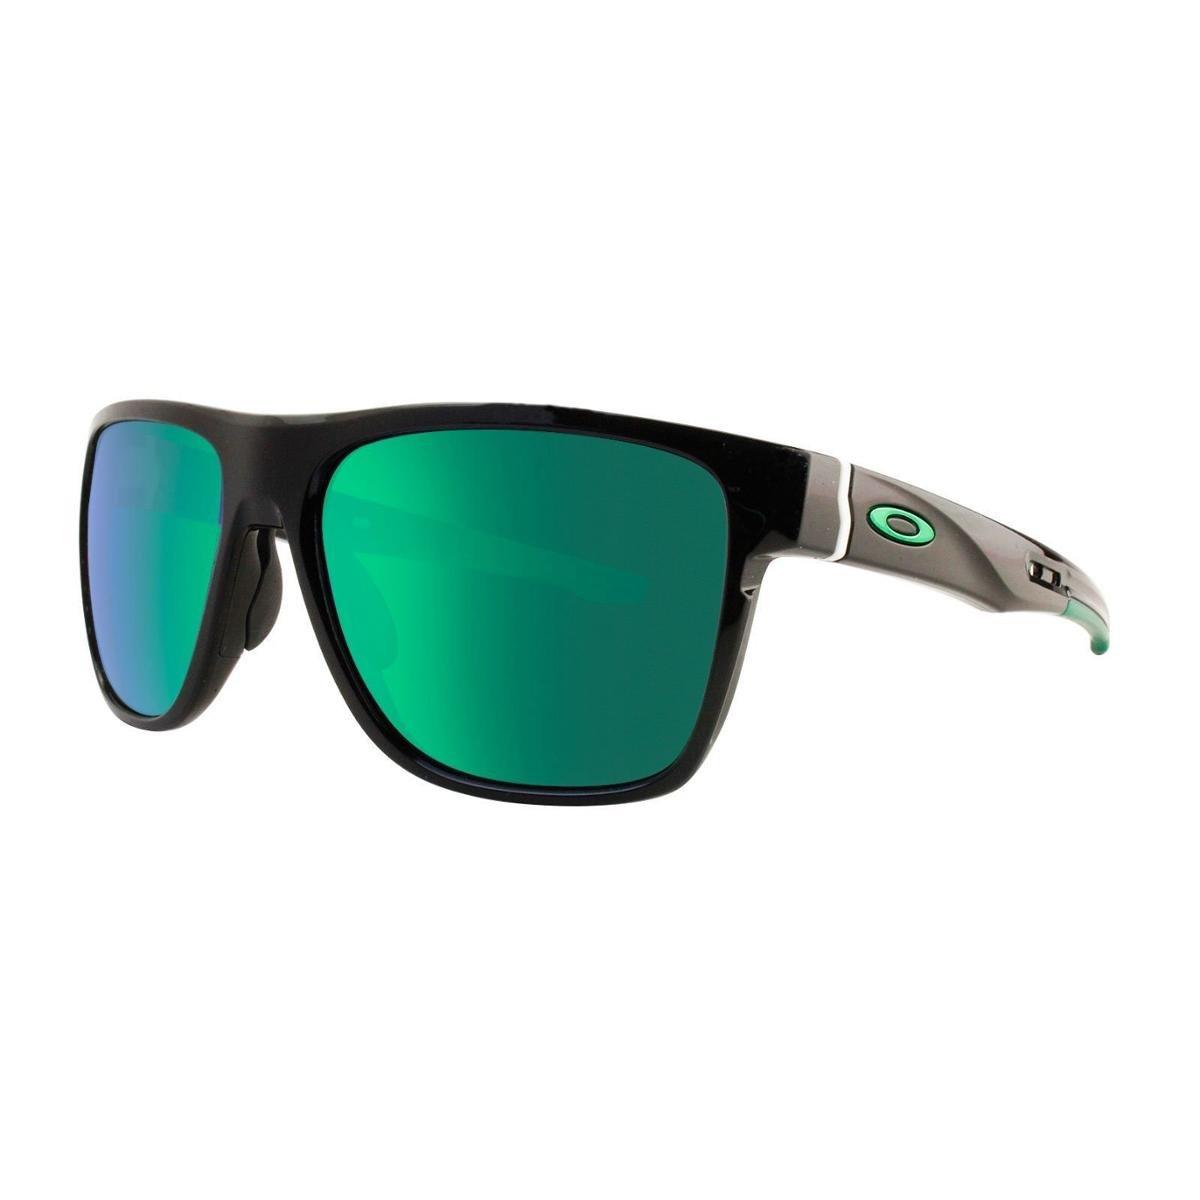 050838b97 Óculos de Sol Oakley Crossrange XL OO9360 - Polished Black - Prizm Black  Polarized - Compre Agora   Zattini